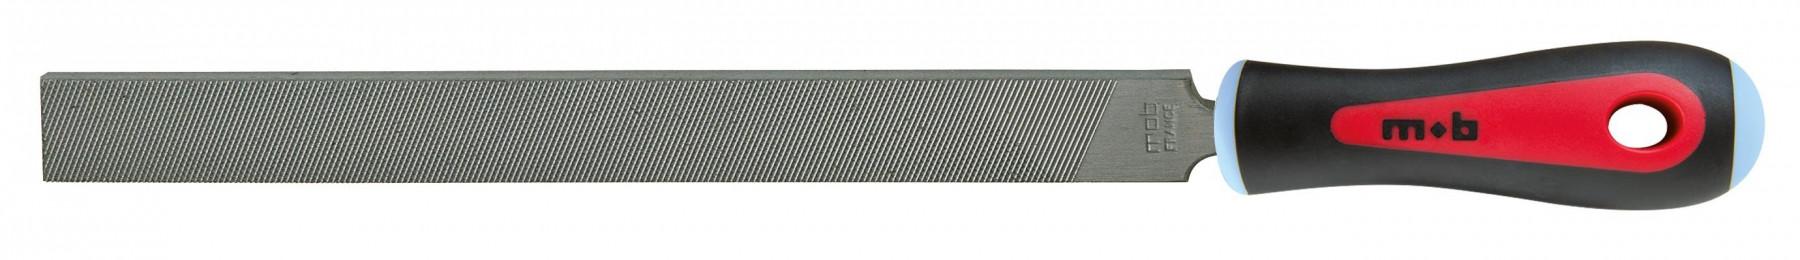 Lime plate 900 mi-douce MOB MONDELIN 200 x 20 x 5 mm - 0900206201